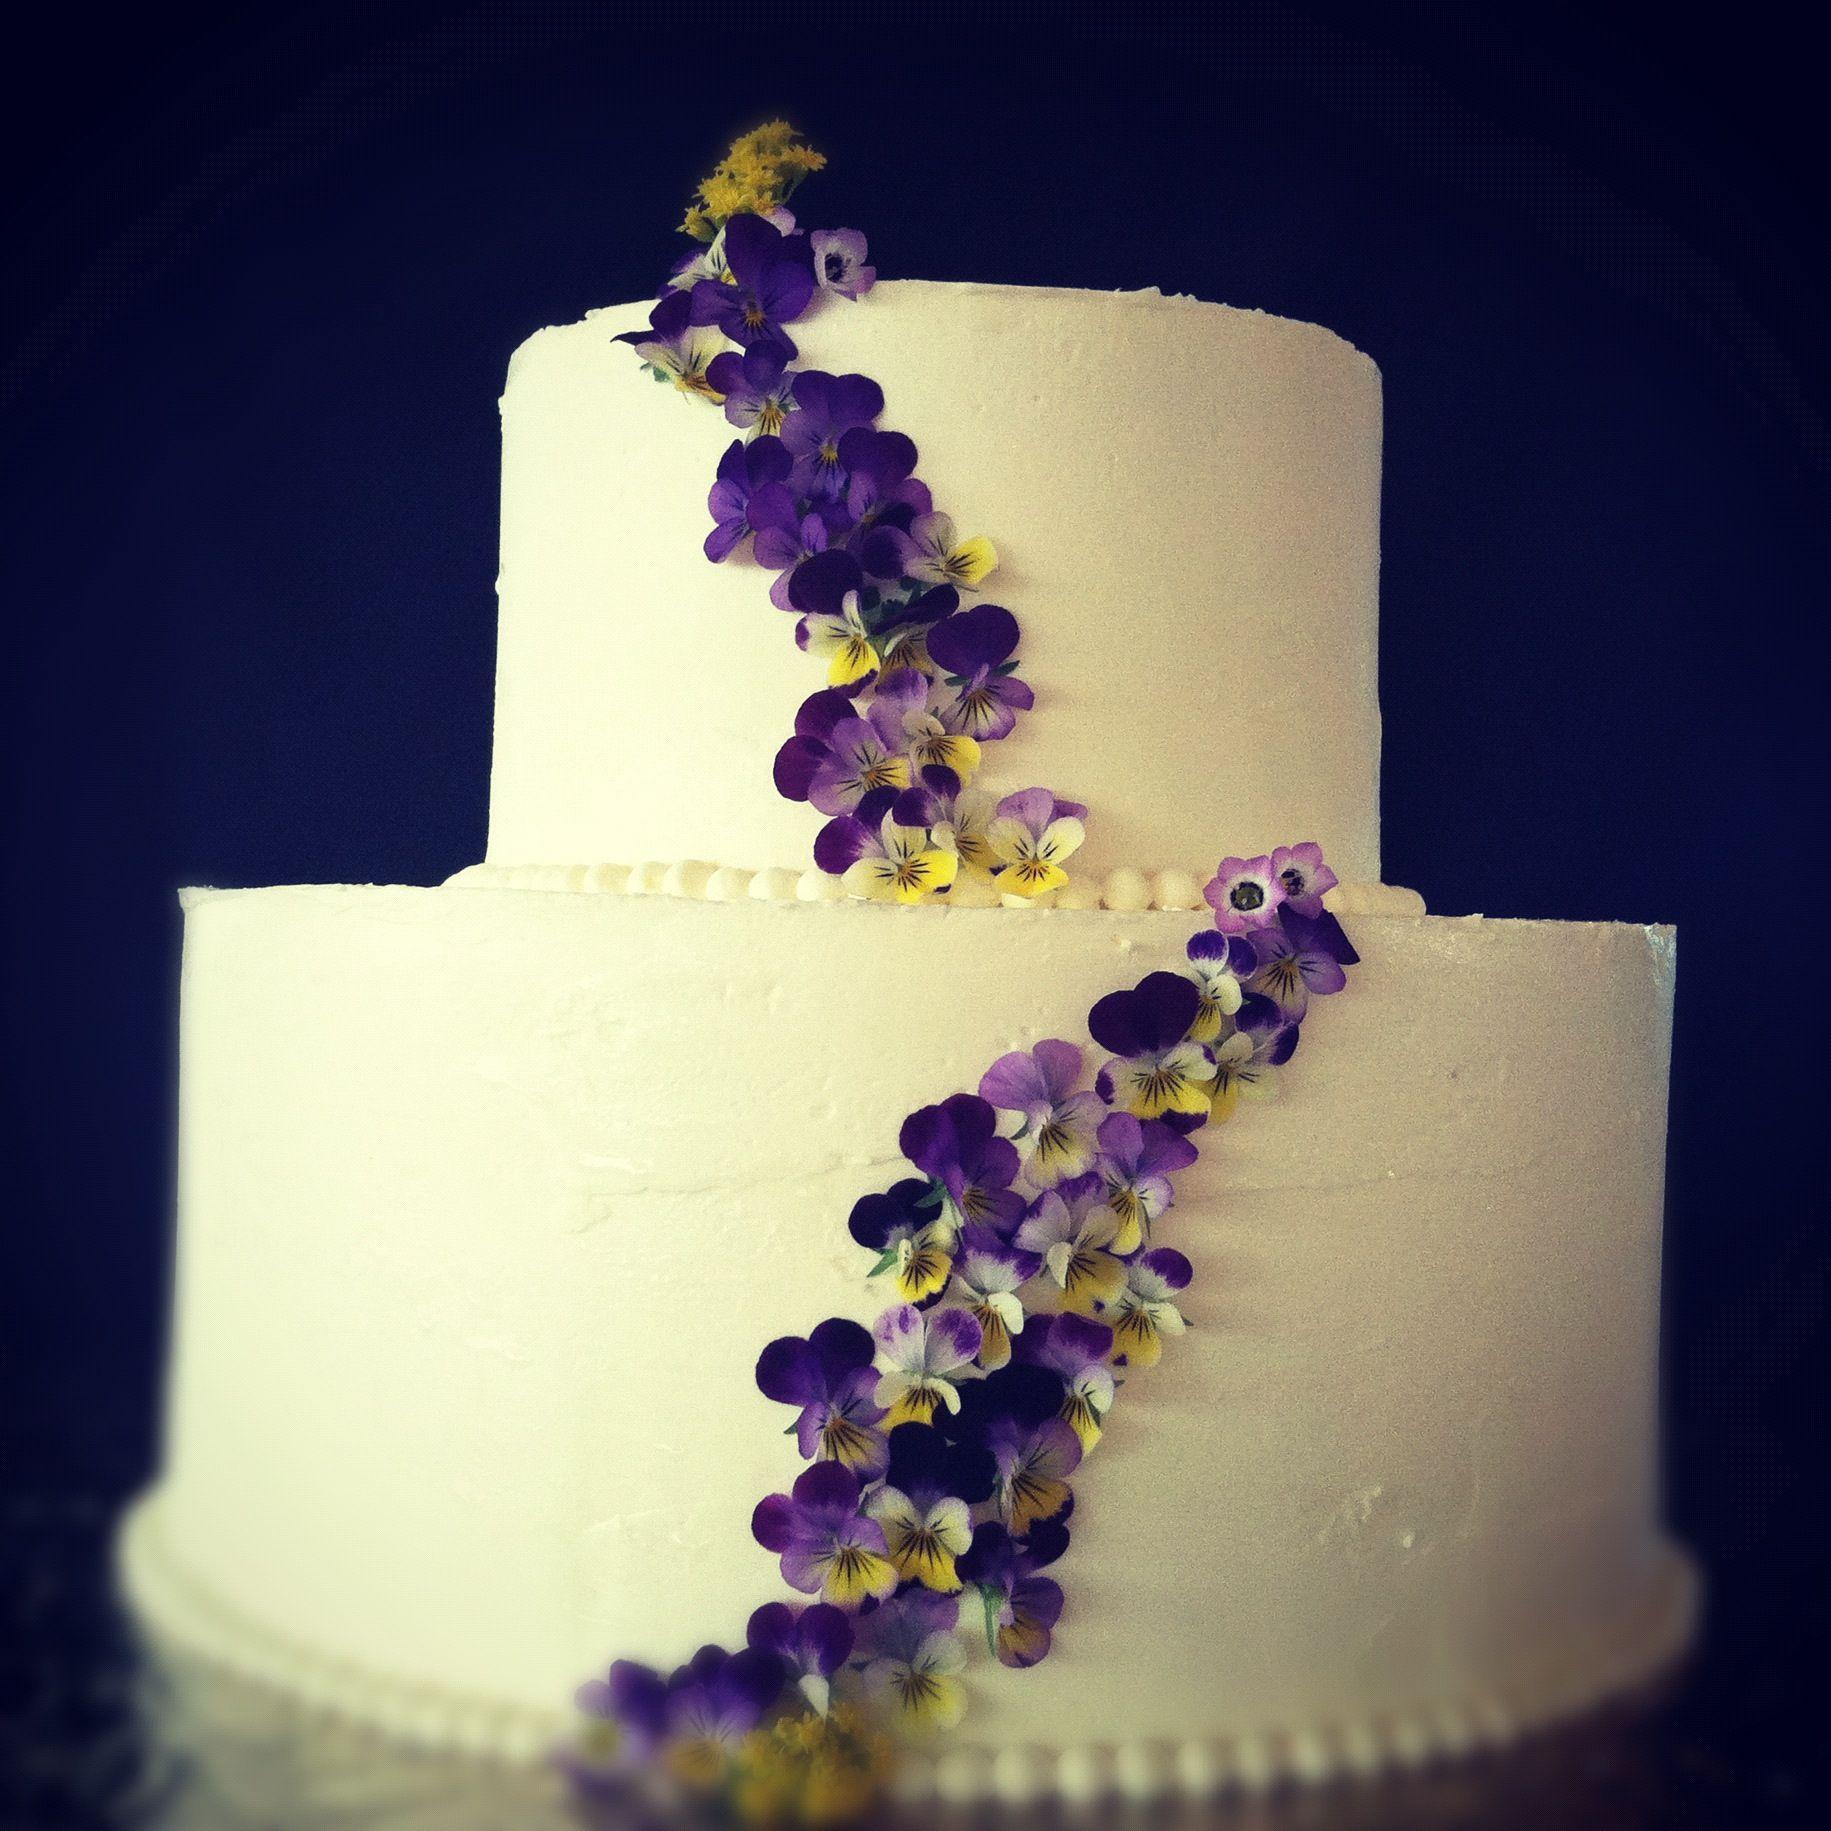 wedding cakes with panseys - Google Search   Jewel Tones   Pinterest ...